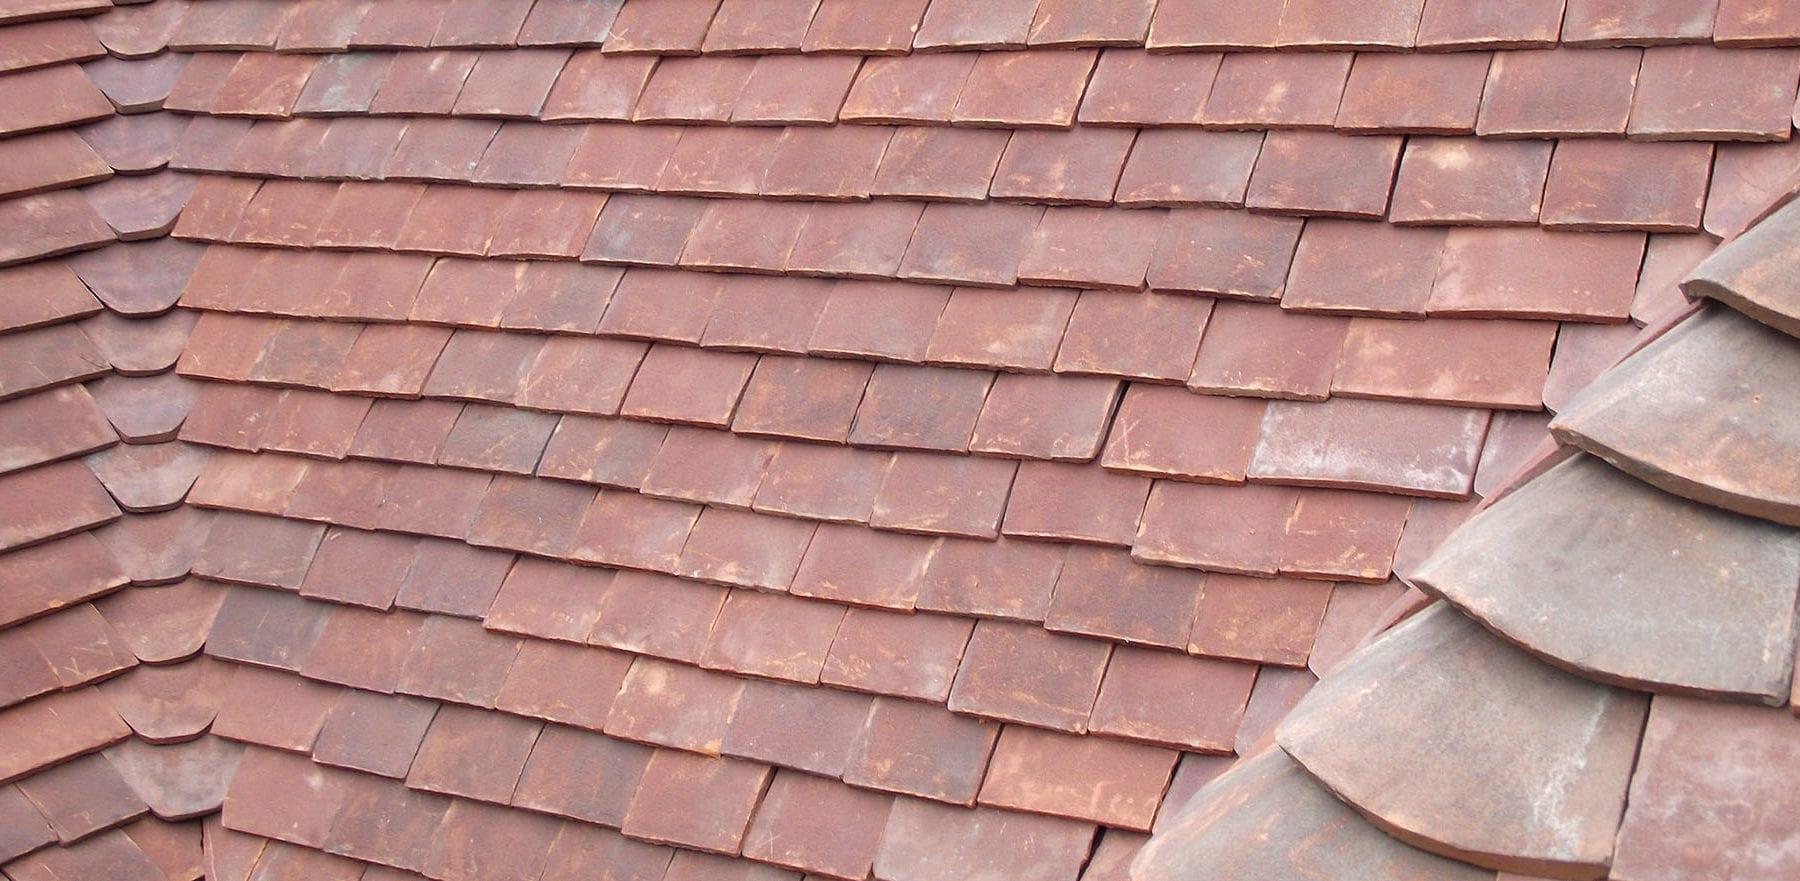 Lifestiles - Handmade Heather Clay Roof Tiles - Bickley, England 7